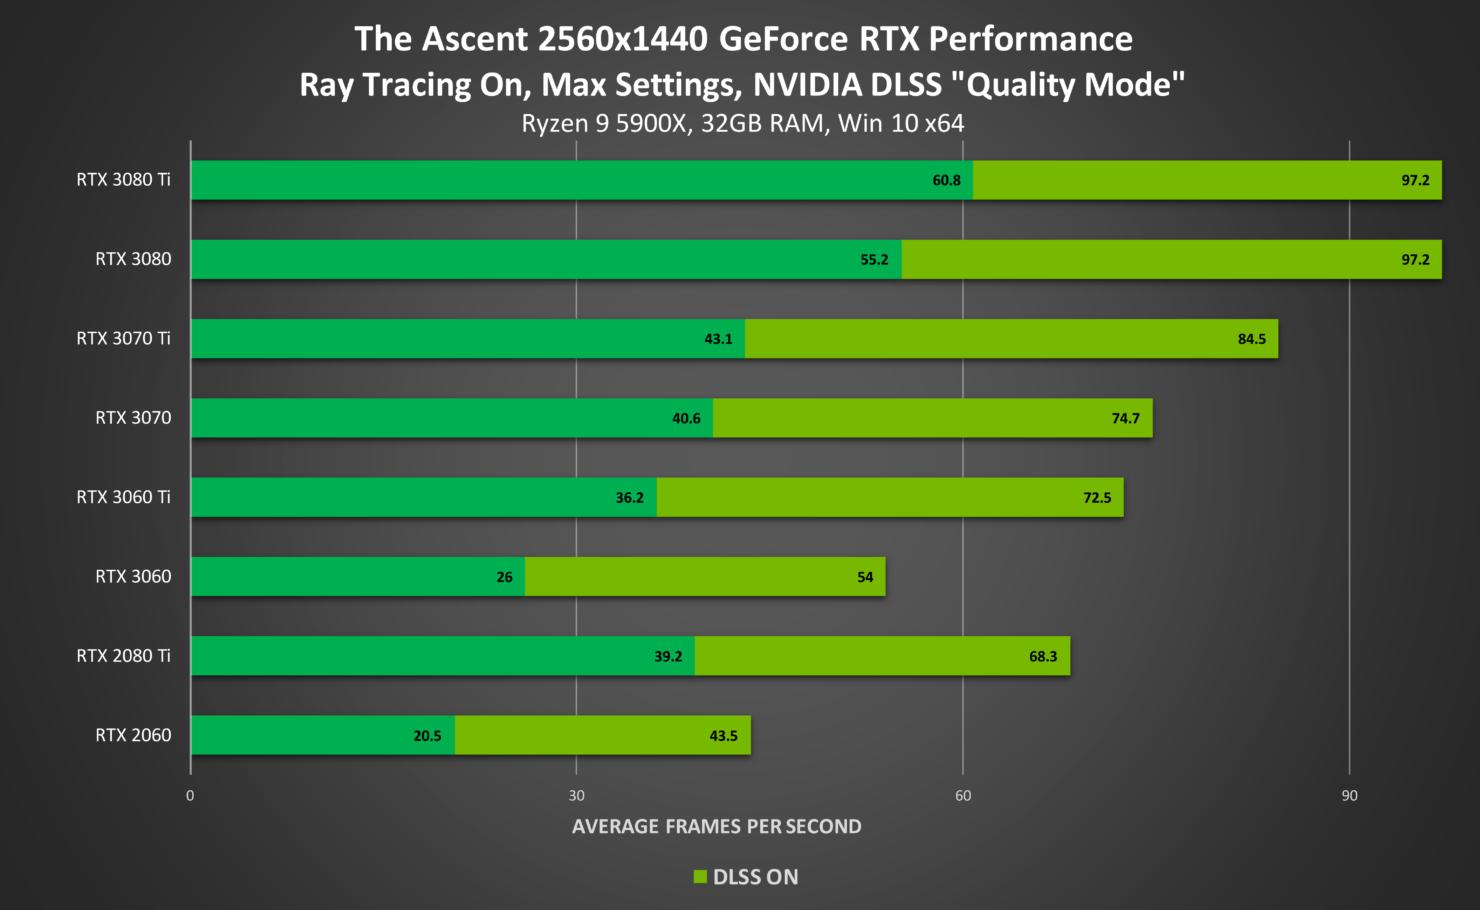 the-ascent-geforce-rtx-2560x1440-ray-tracing-on-nvidia-dlss-desktop-gpu-performance